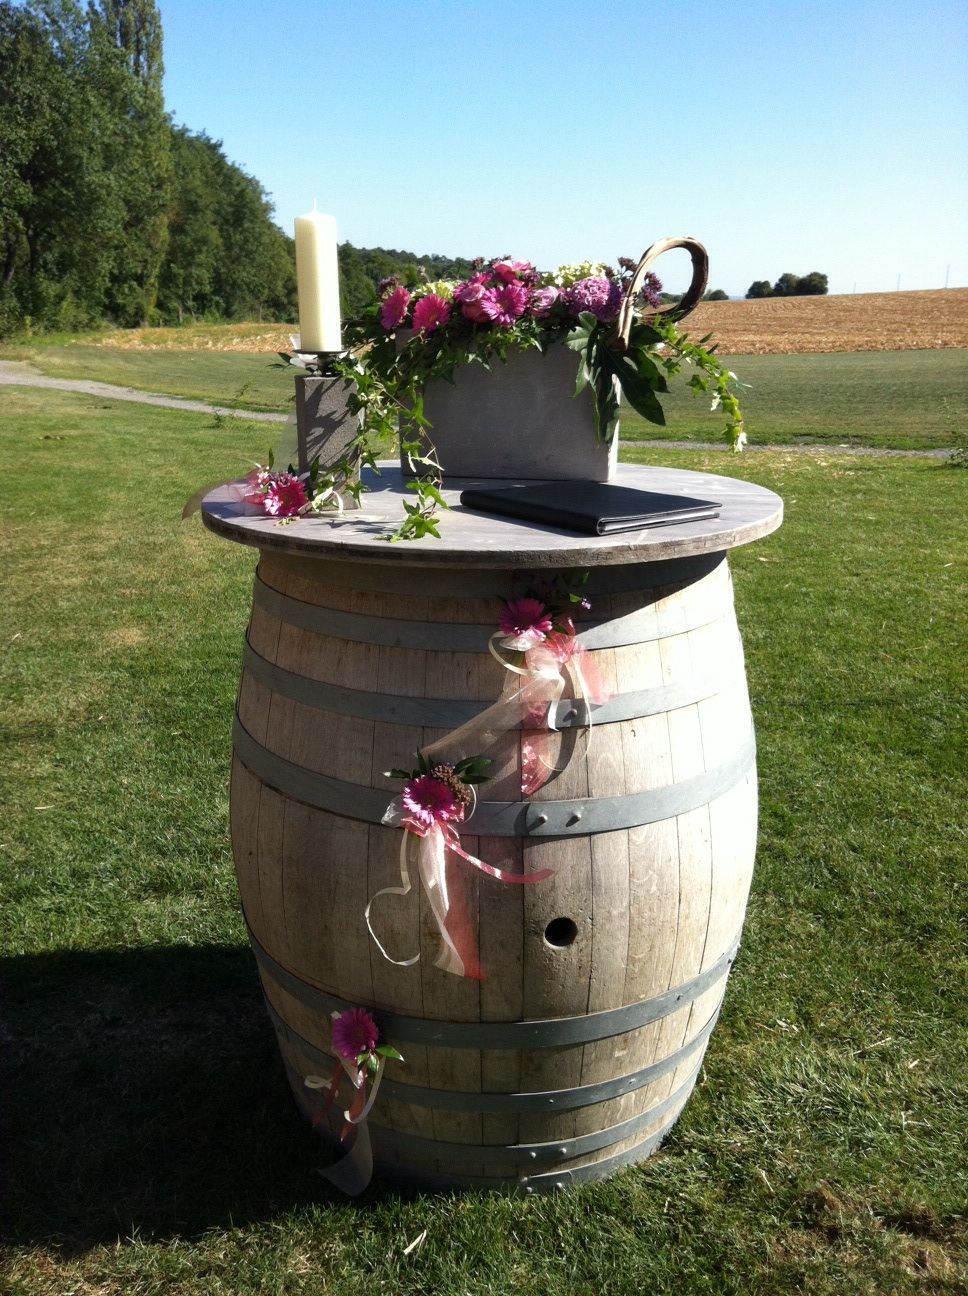 Freie Trauung Deko Freie Trauung Wedding Ceremony Pinterest